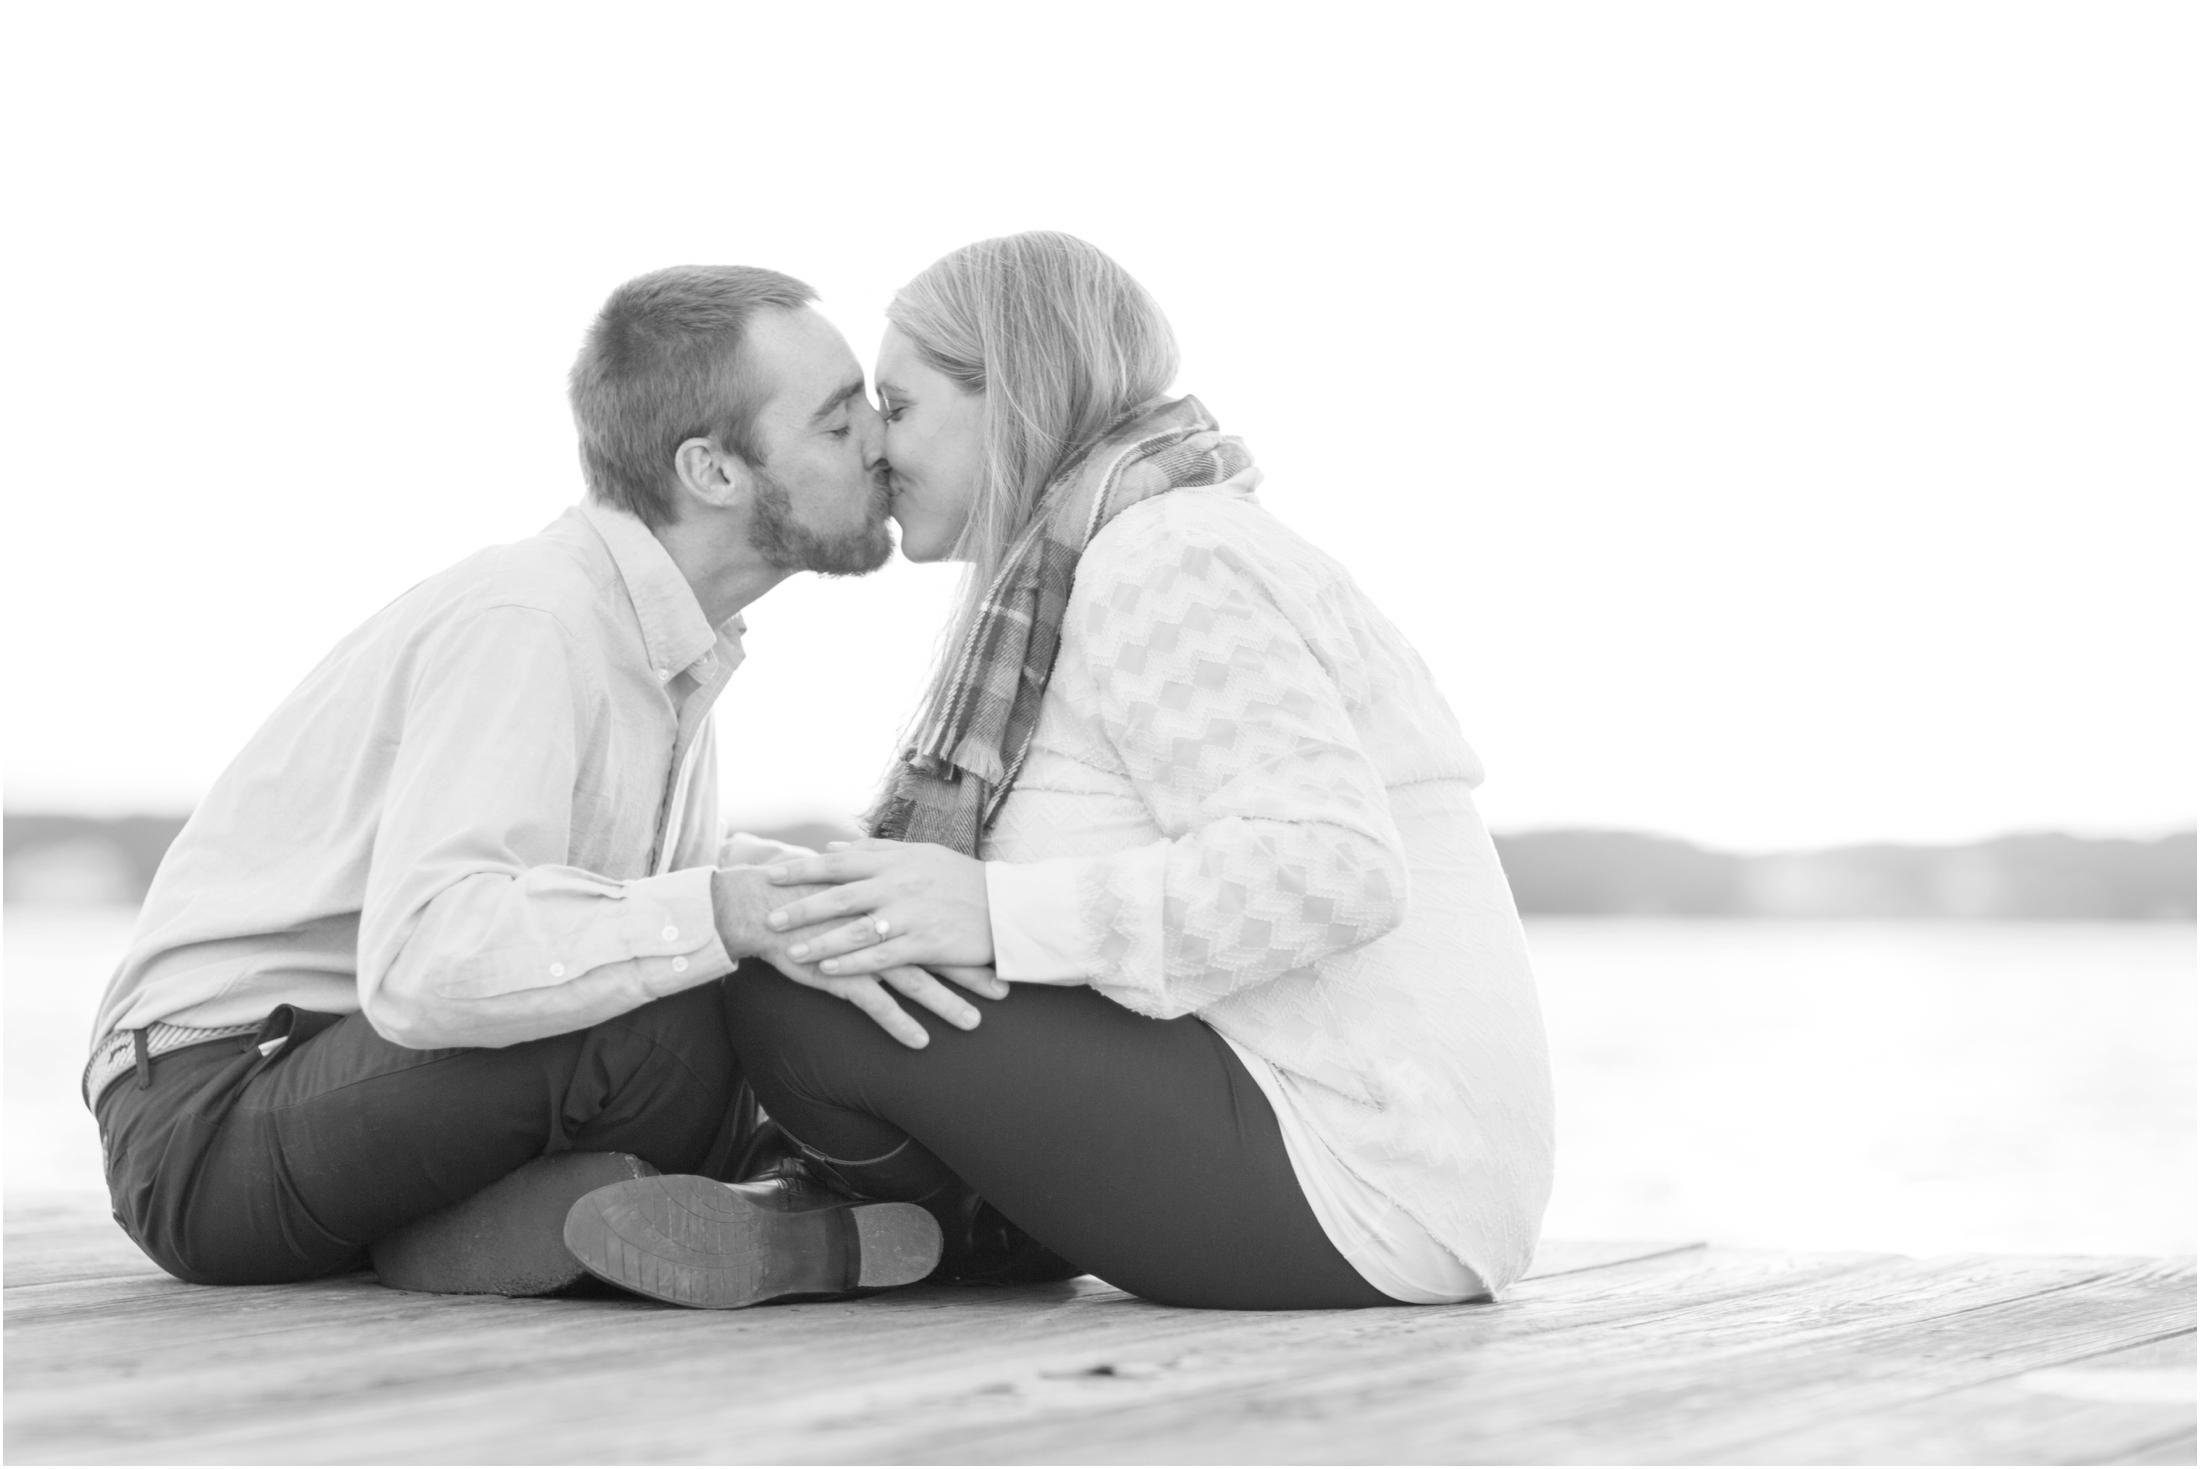 Morgan-Zach-Engaged-265.jpg